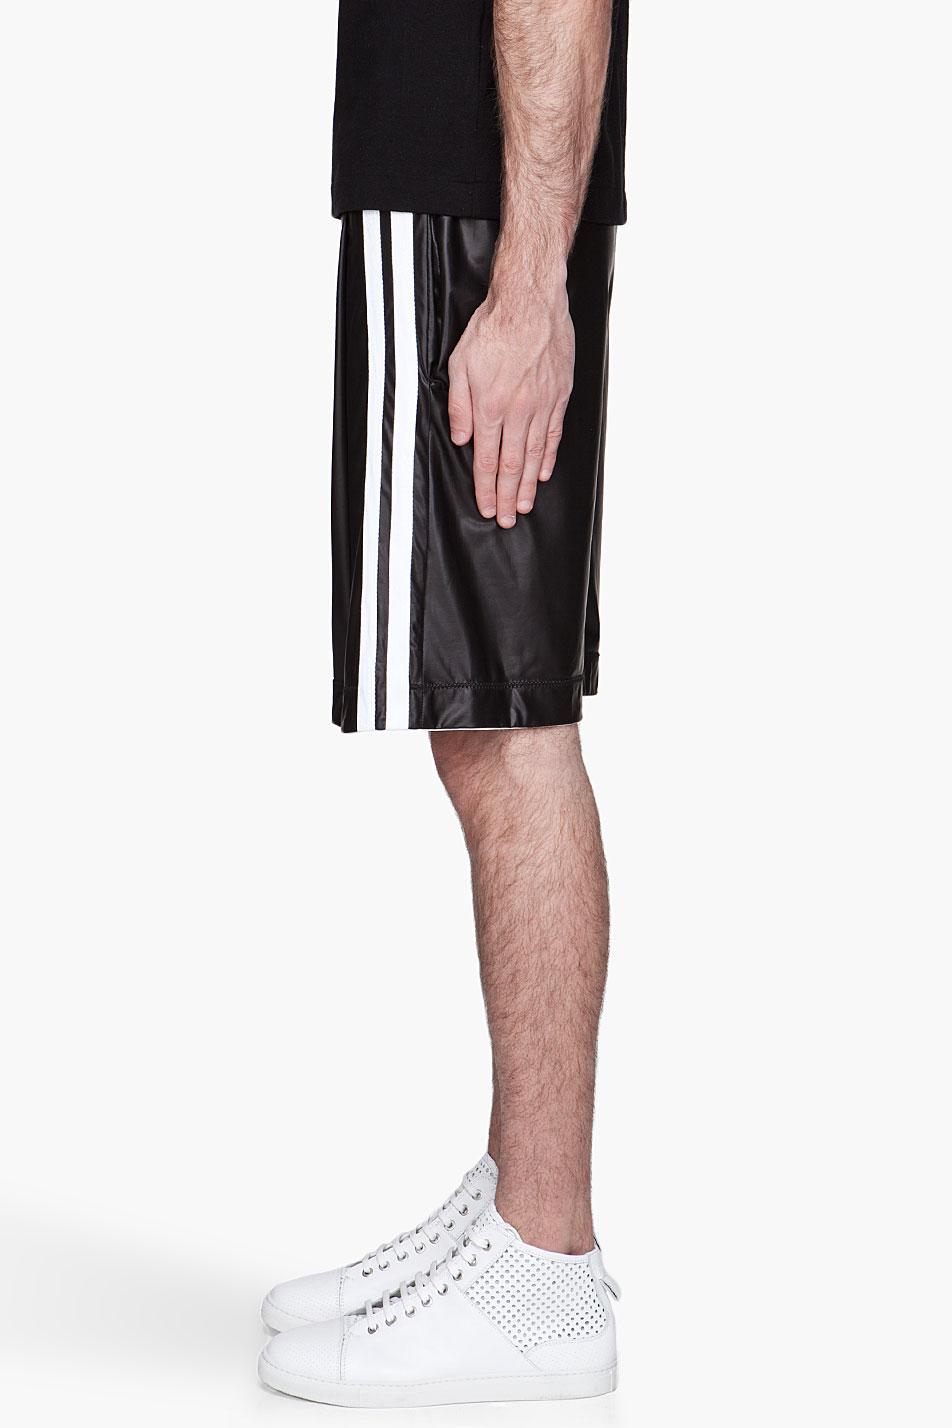 Denis gagnon Black White Striped Basketball Shorts in ...